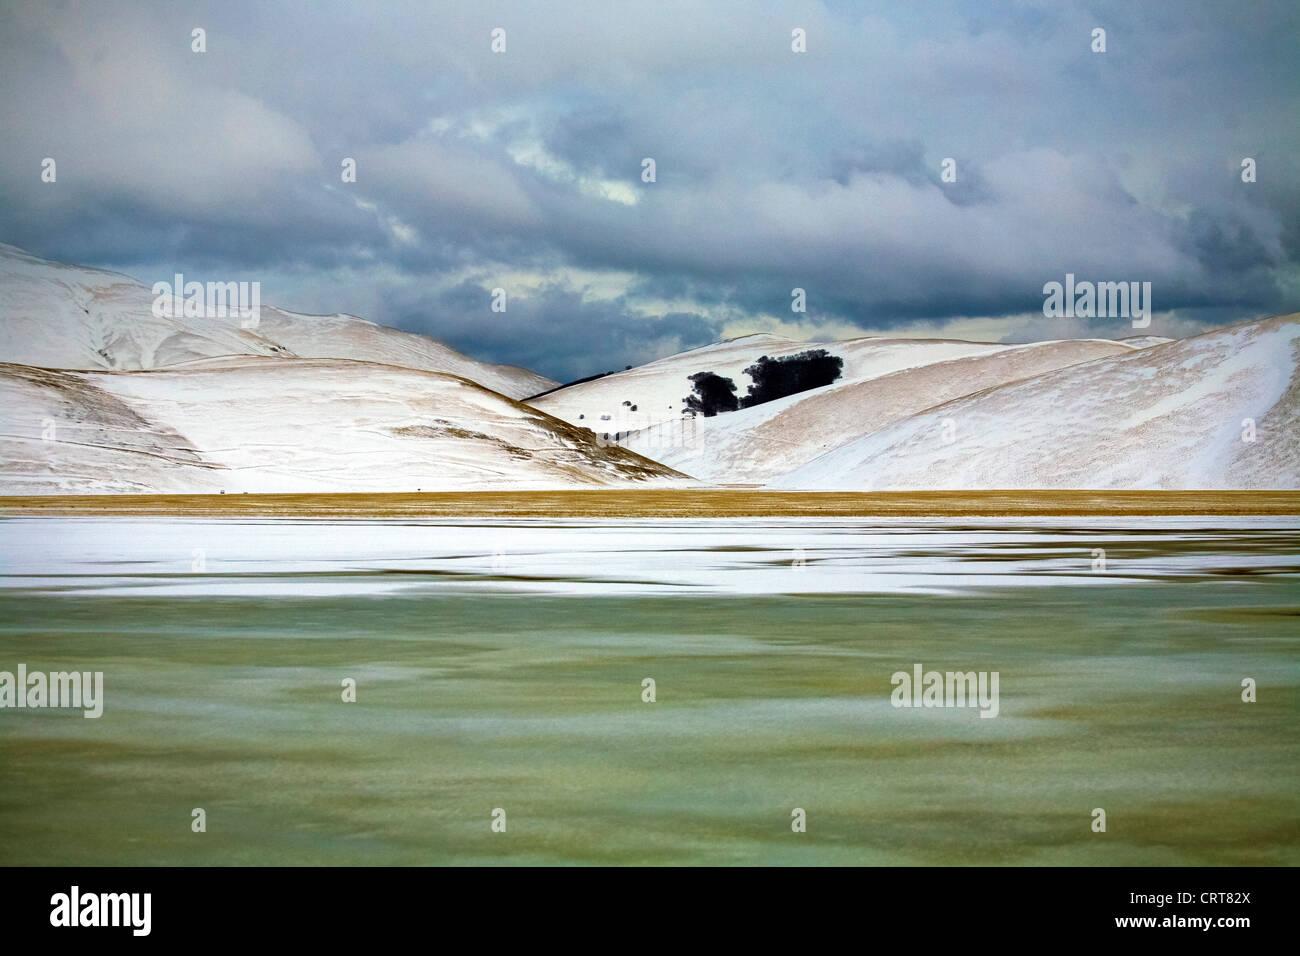 Europa Italy Umbria Castelluccio da Norcia Province of Perugia  Mount Sibillini National park Landscape with snow - Stock Image